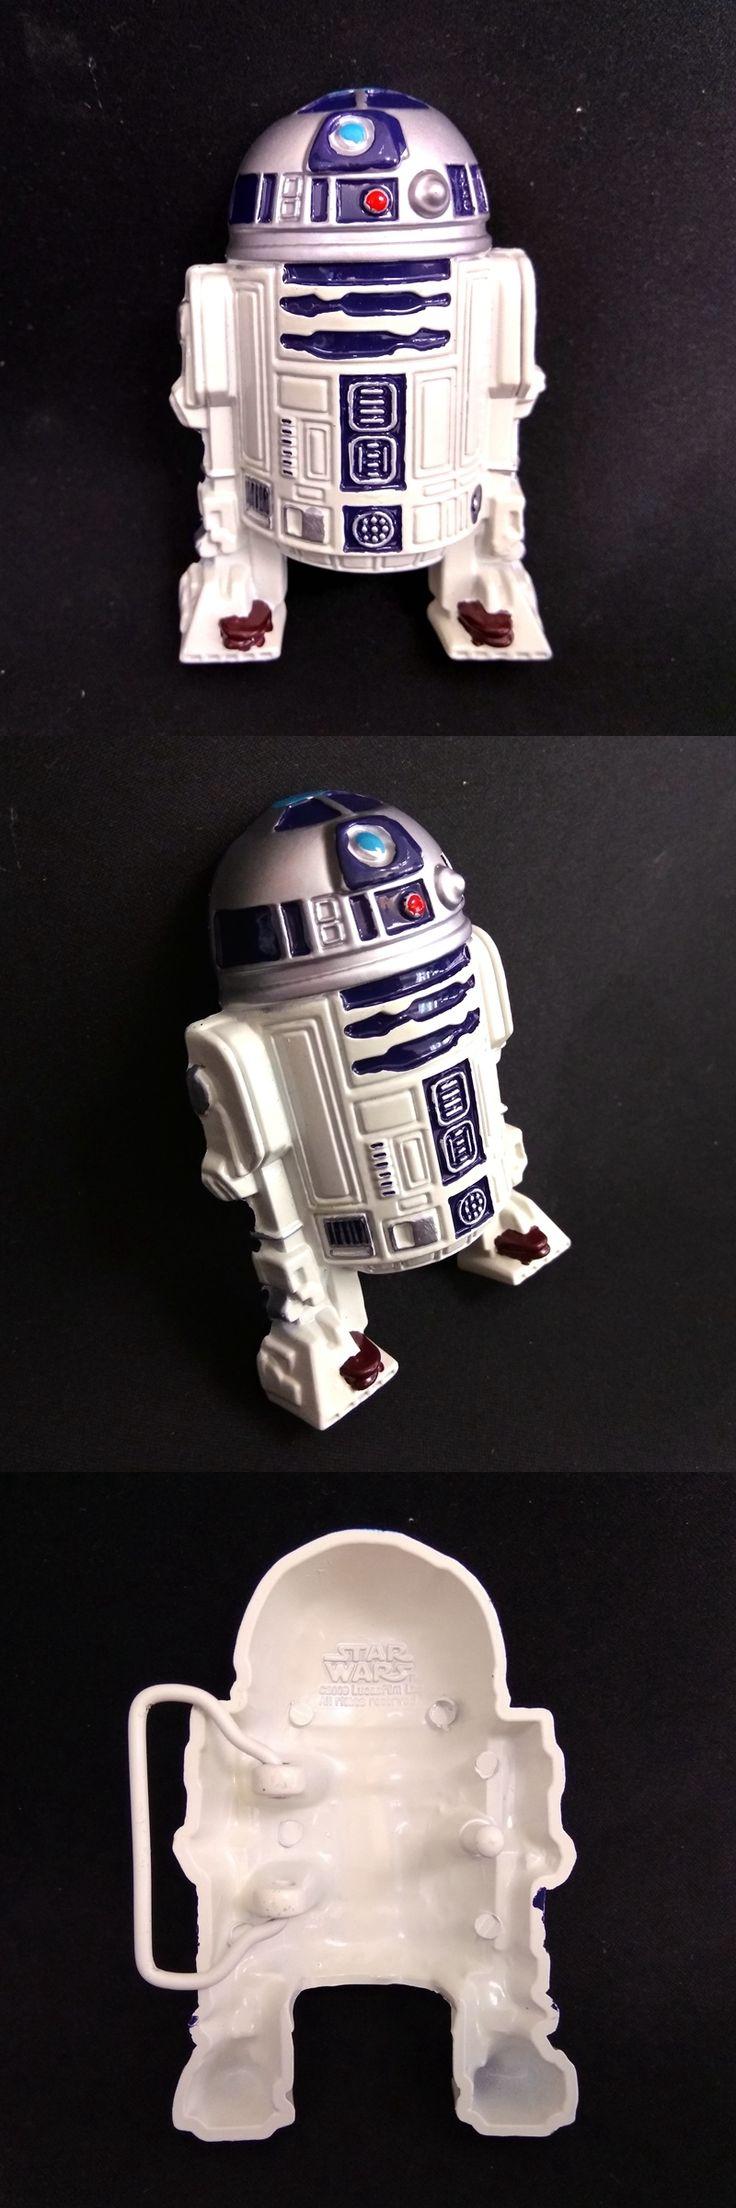 New Male Cool 3D Star Wars R2D2 Robot Big Belt Buckle Metallic Gift for Man DIY Belts Jeans Accessories Boucle Ceinture Hombre